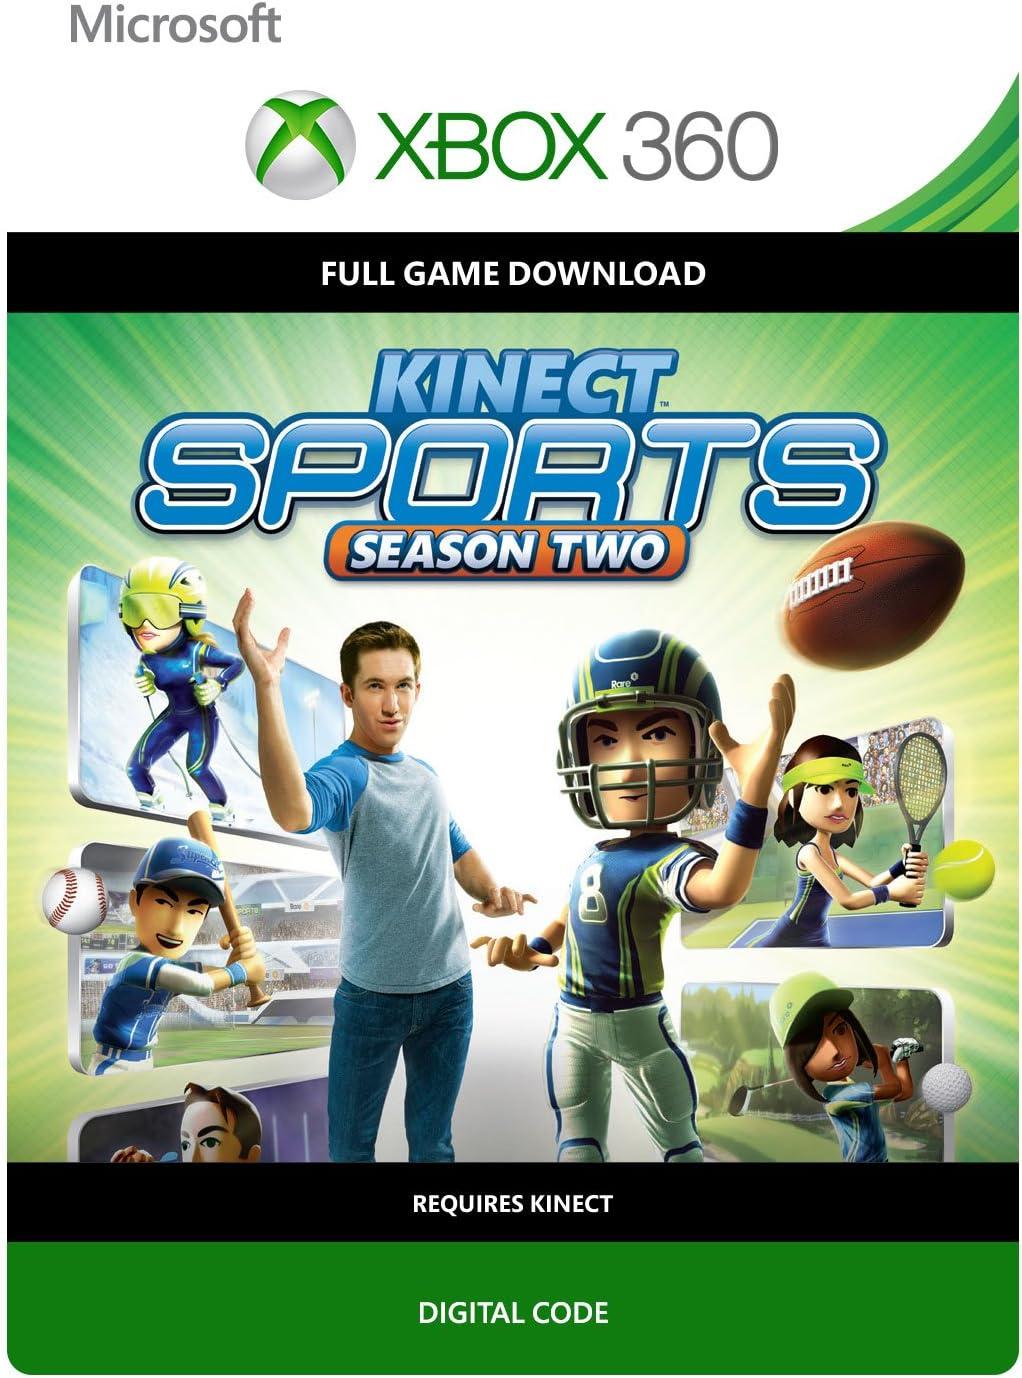 Amazon.com: Kinect Sports Season 2 - Xbox 360 Digital Code ...